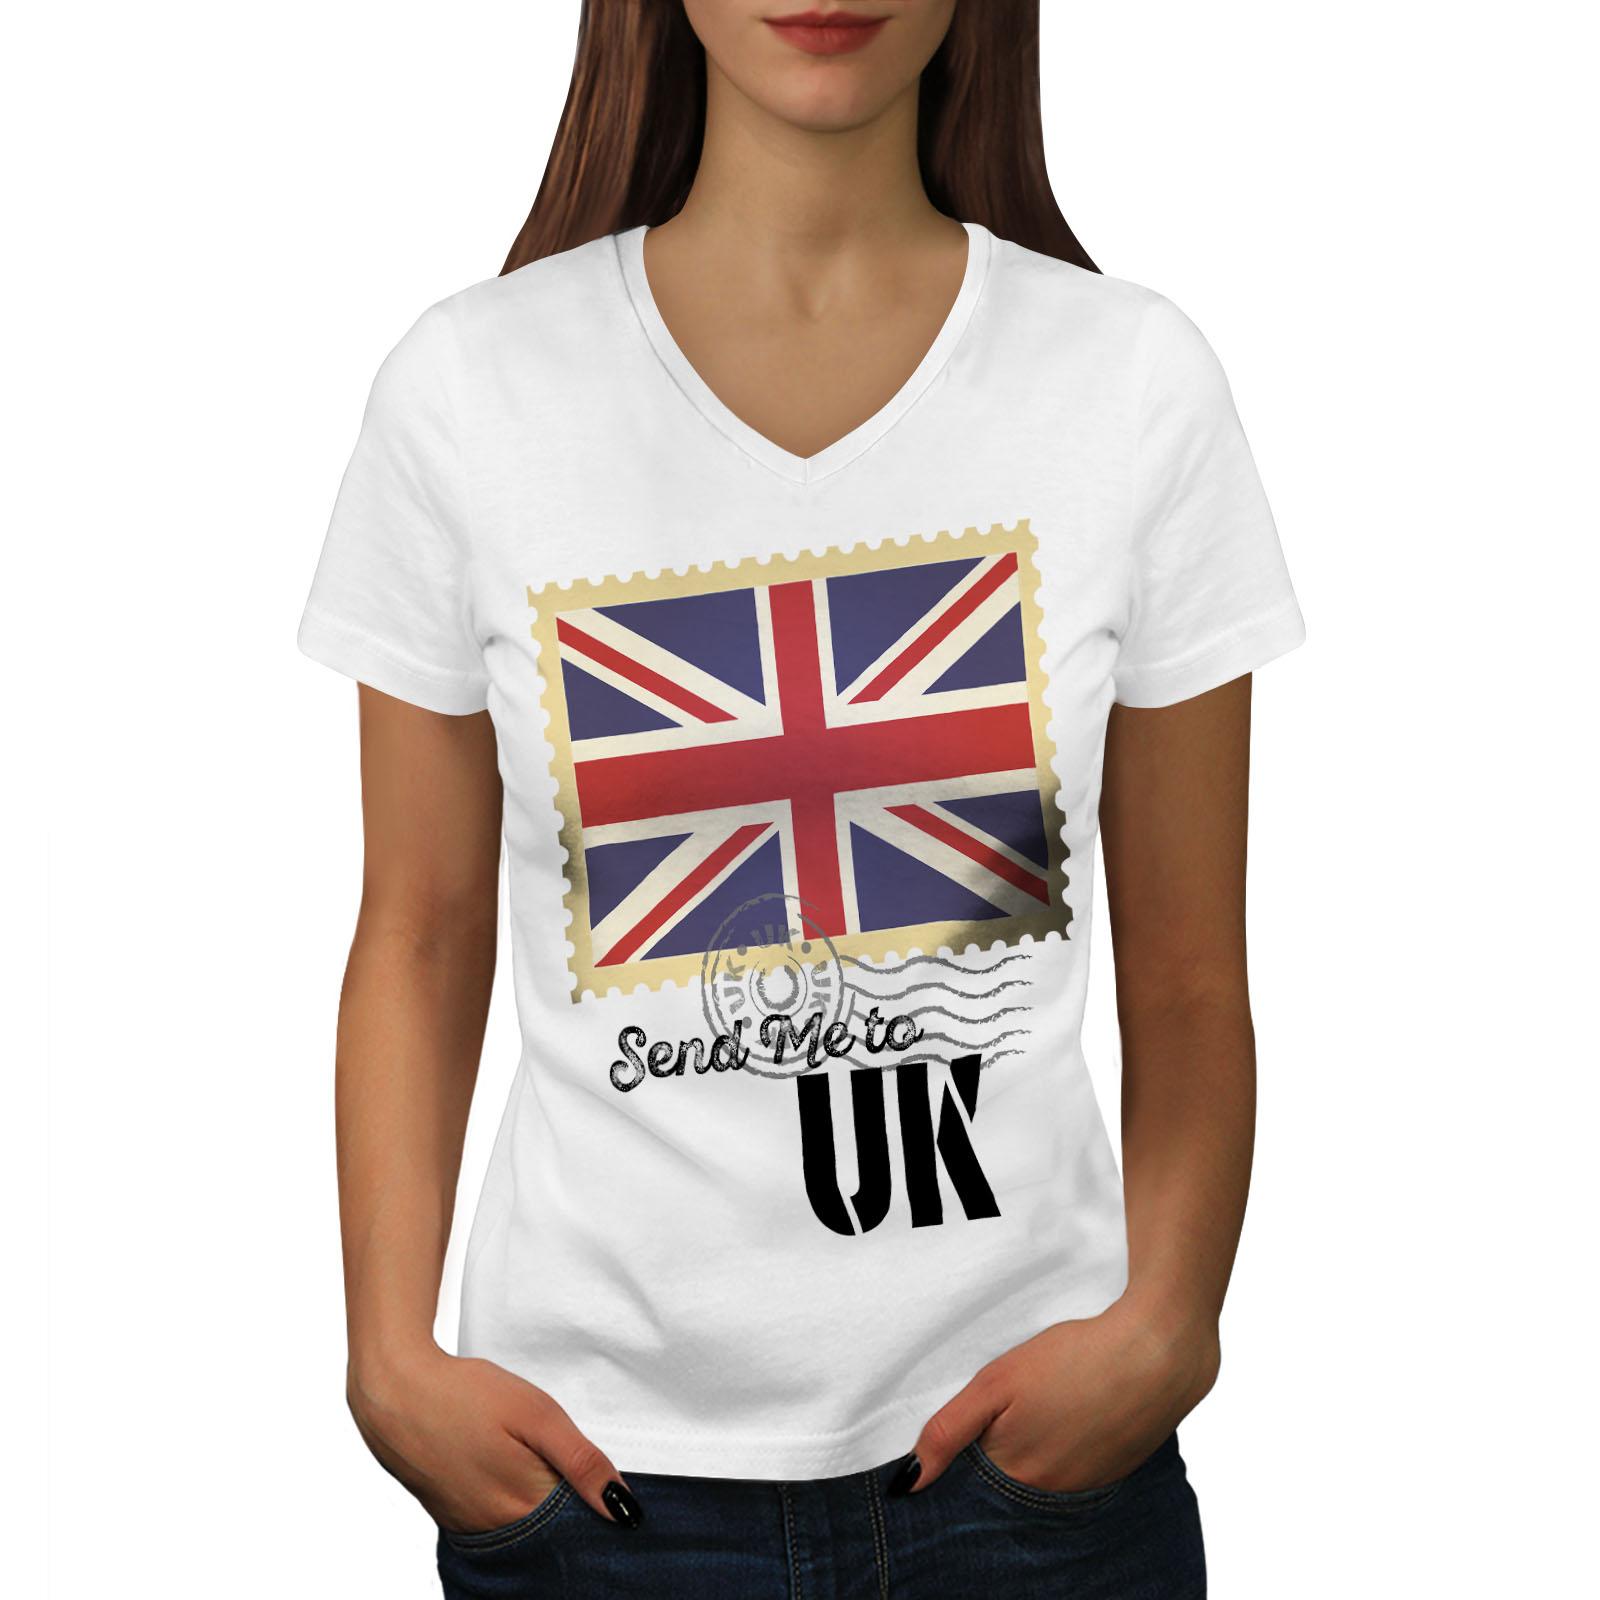 Wellcoda-UK-Flag-Tourist-Womens-V-Neck-T-shirt-England-Graphic-Design-Tee thumbnail 7